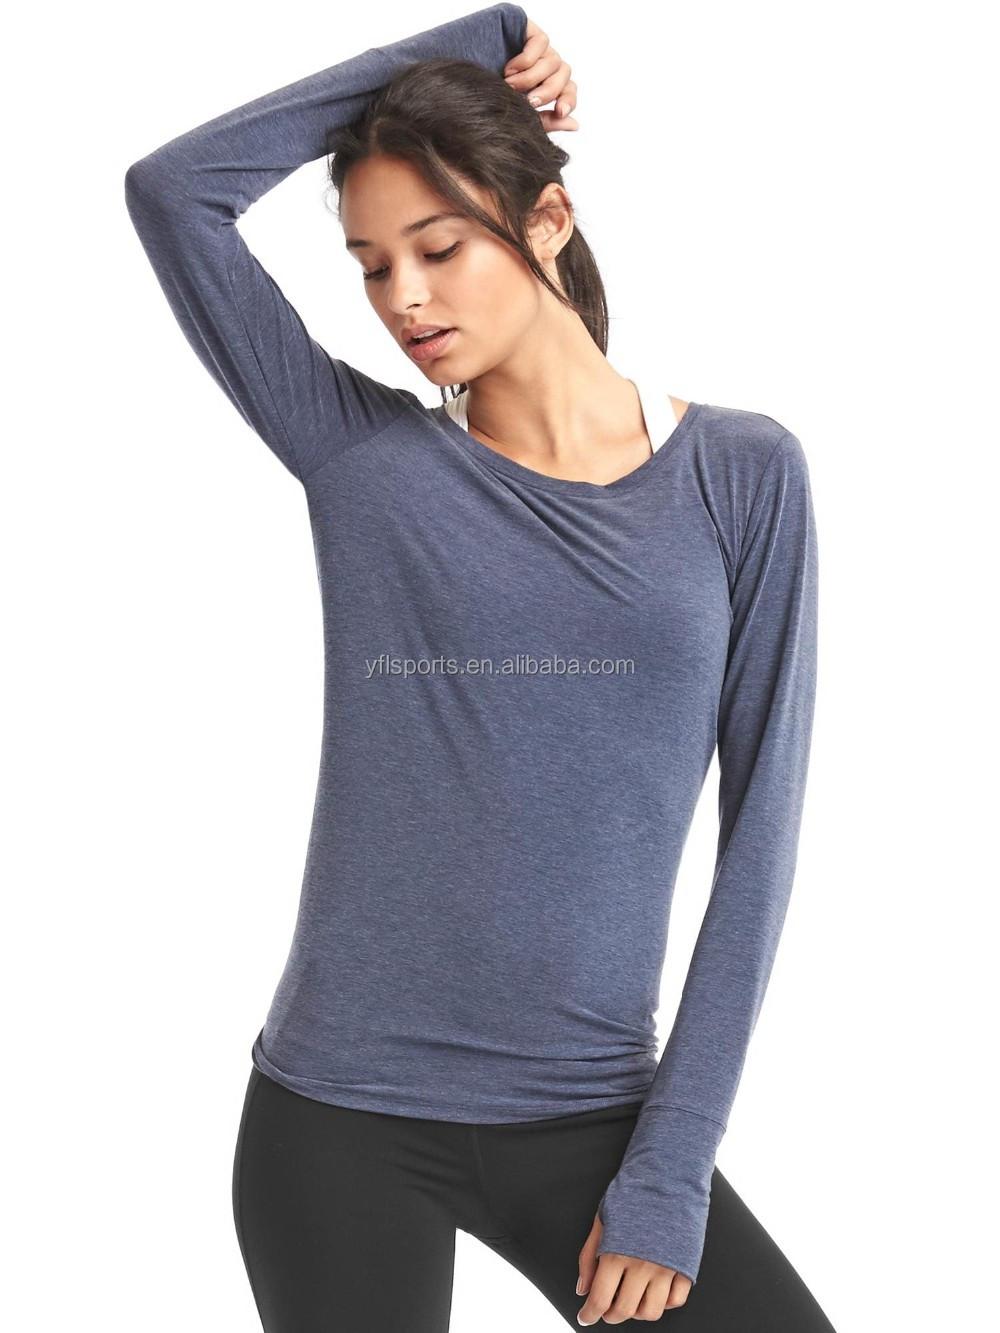 Wholesale Fashion Fitness Sports Tee Long Sleve Workout